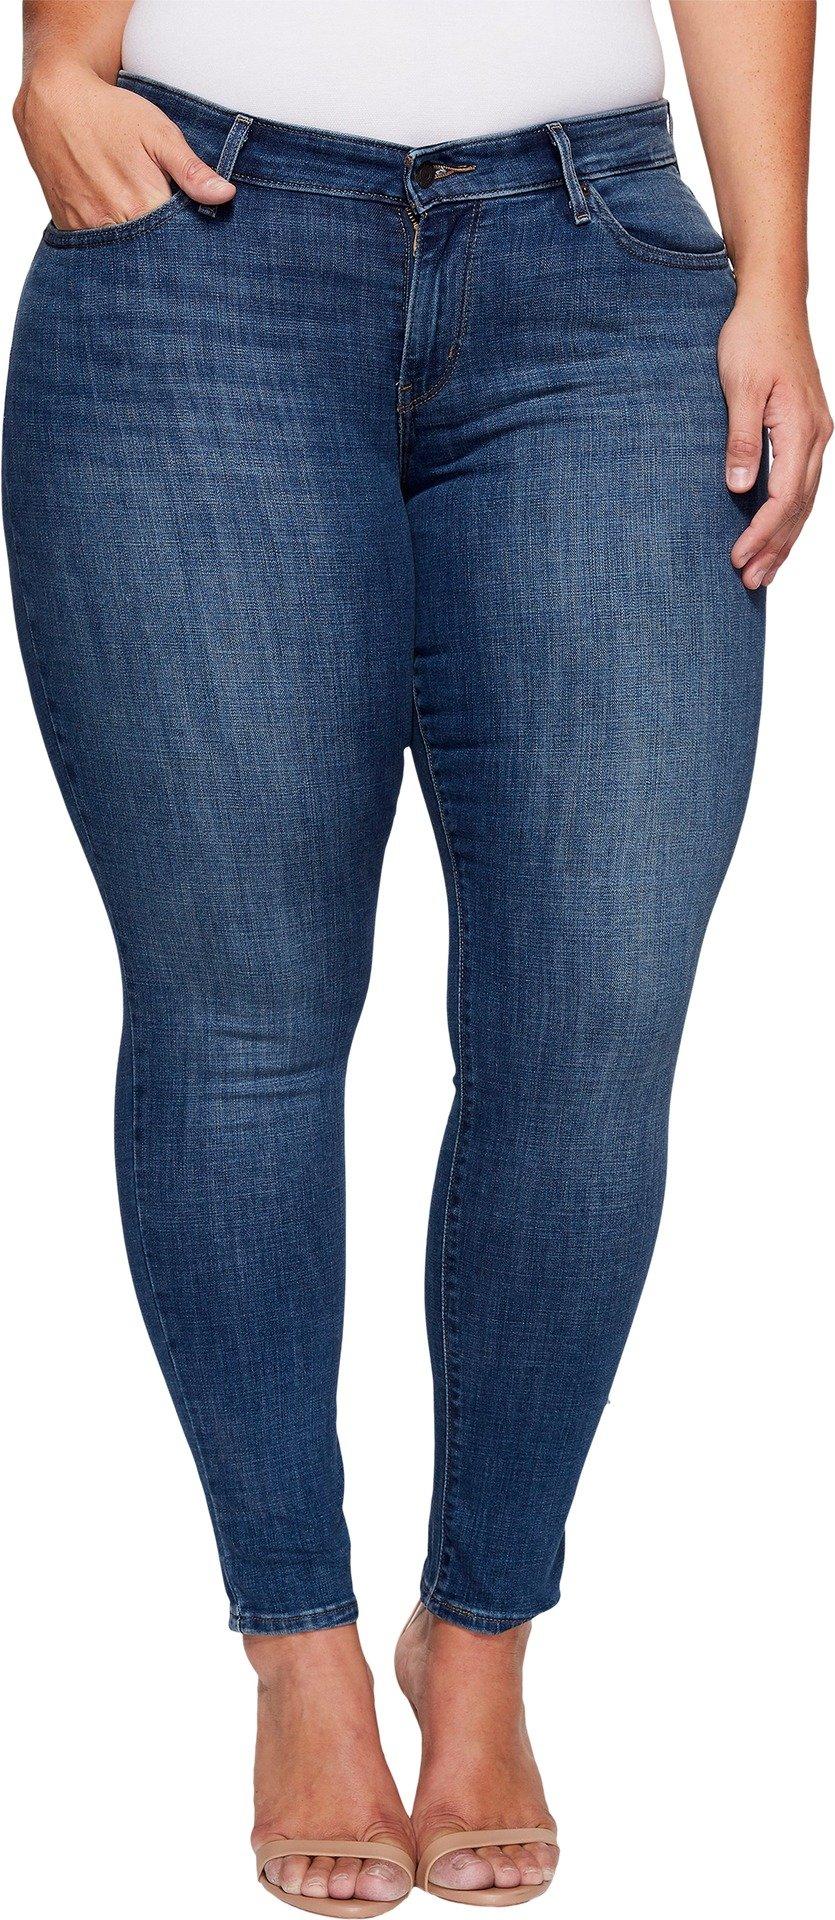 Levi's Women's 711 Skinny Jeans, Indigo Harmony, 36 (US 16) R